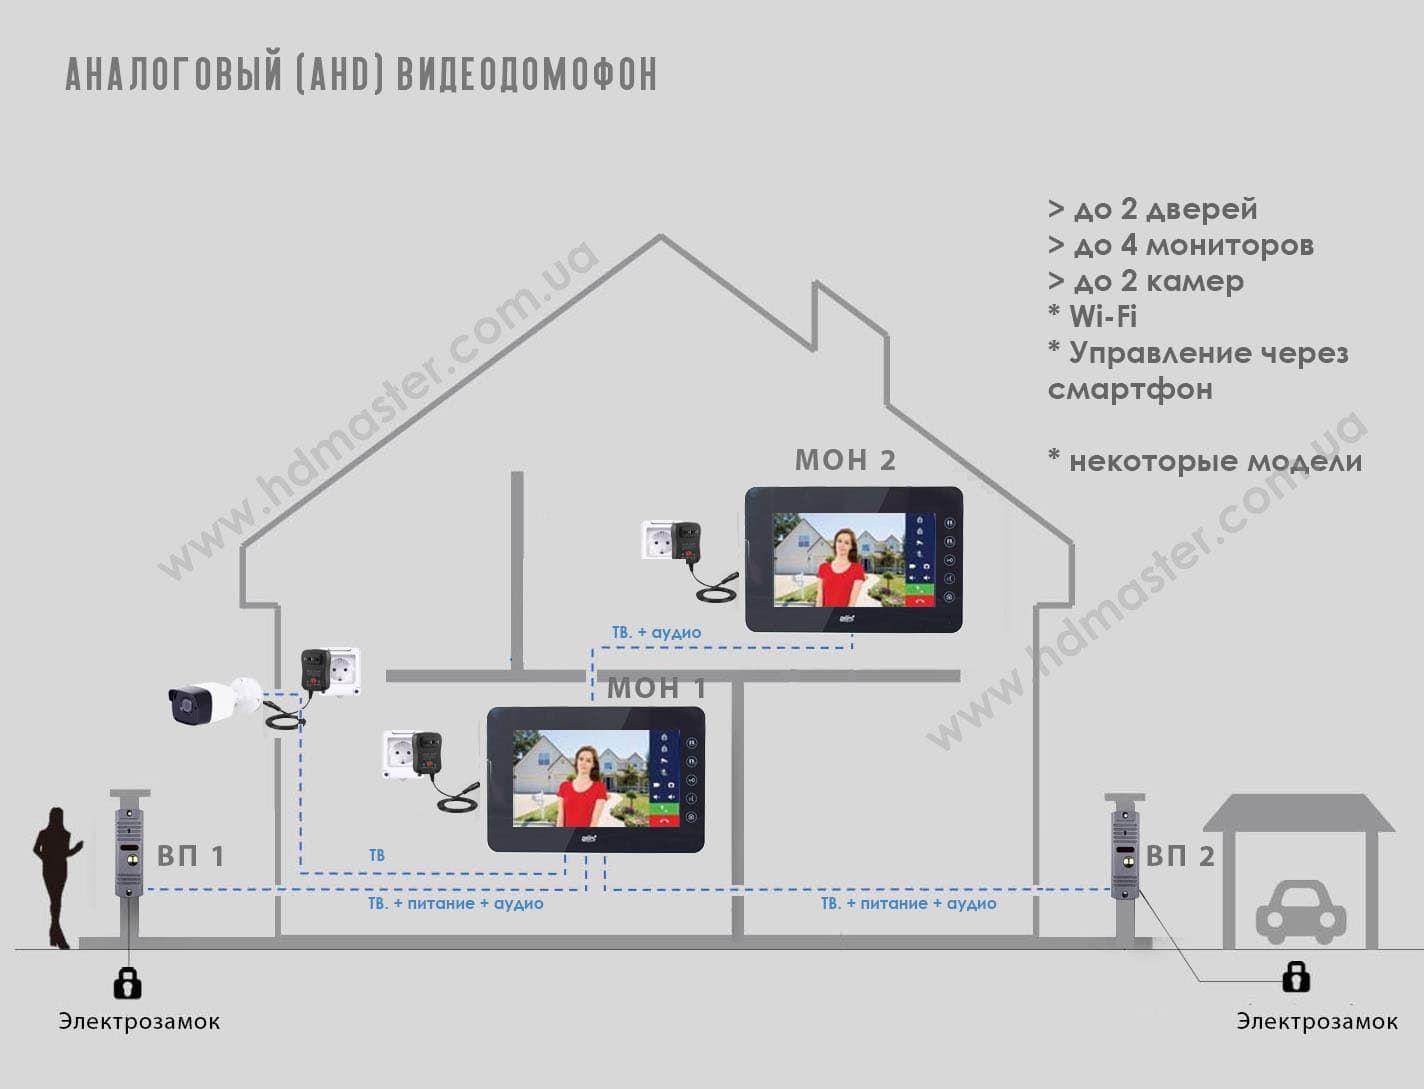 AHD видеодомофон - структурная схема